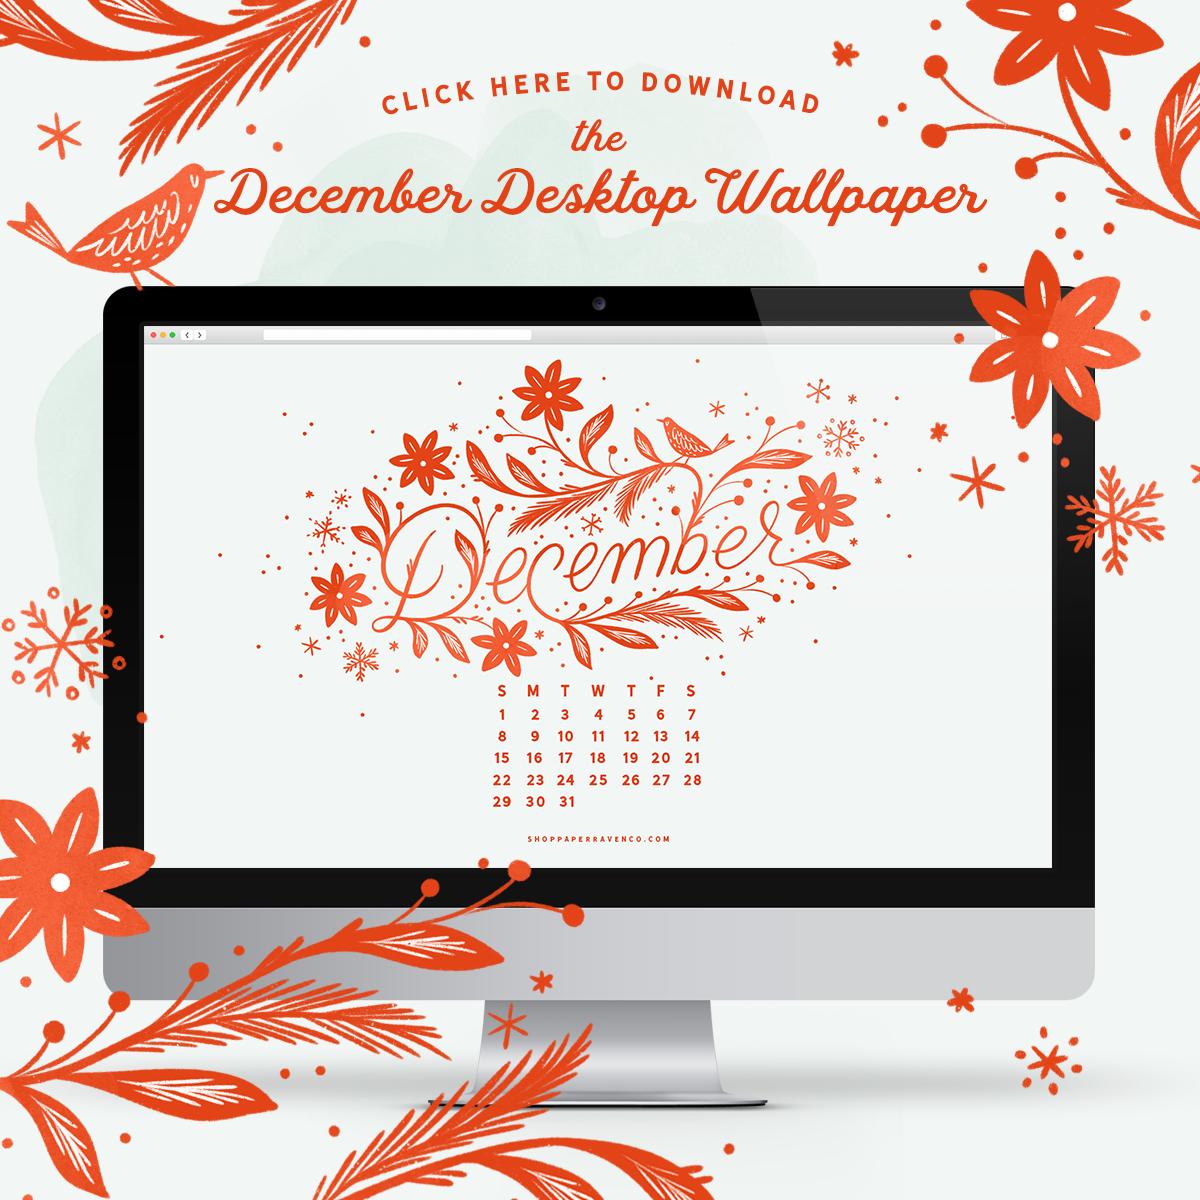 December 2019 Desktop Wallpaper by Paper Raven Co. | www.ShopPaperRavenCo.com #dressyourtech #desktopwallpaper